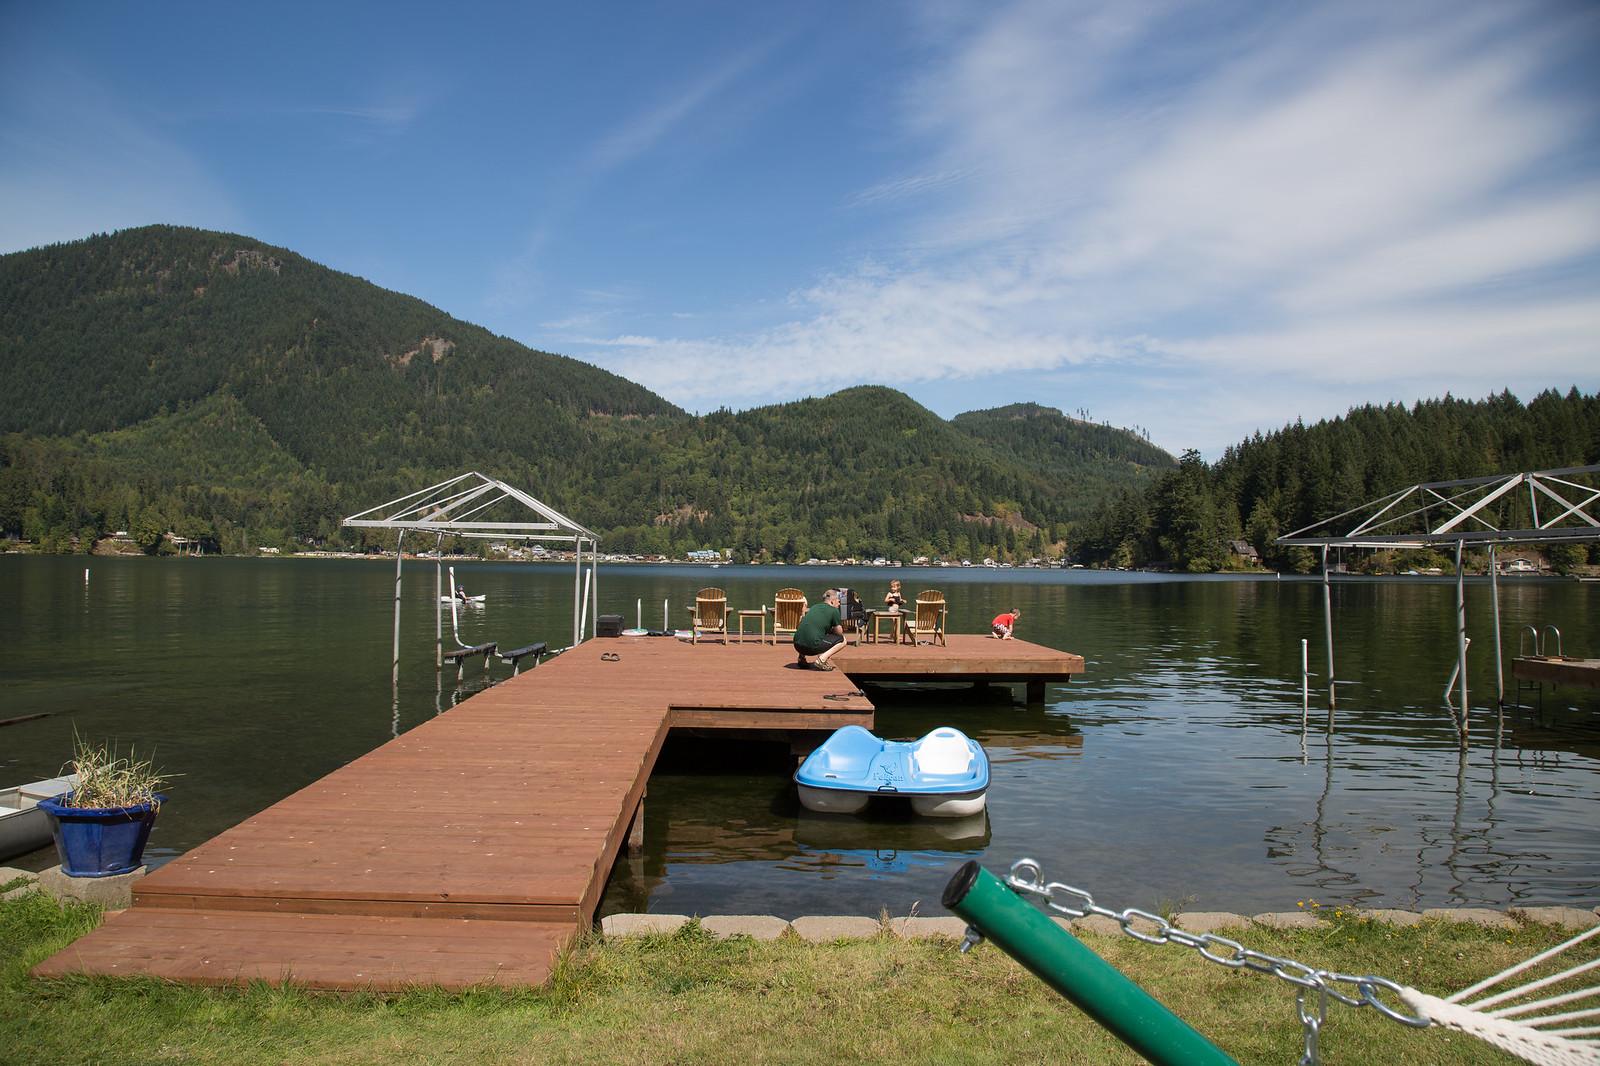 2015-08-24 Lake Sutherland-2805.jpg